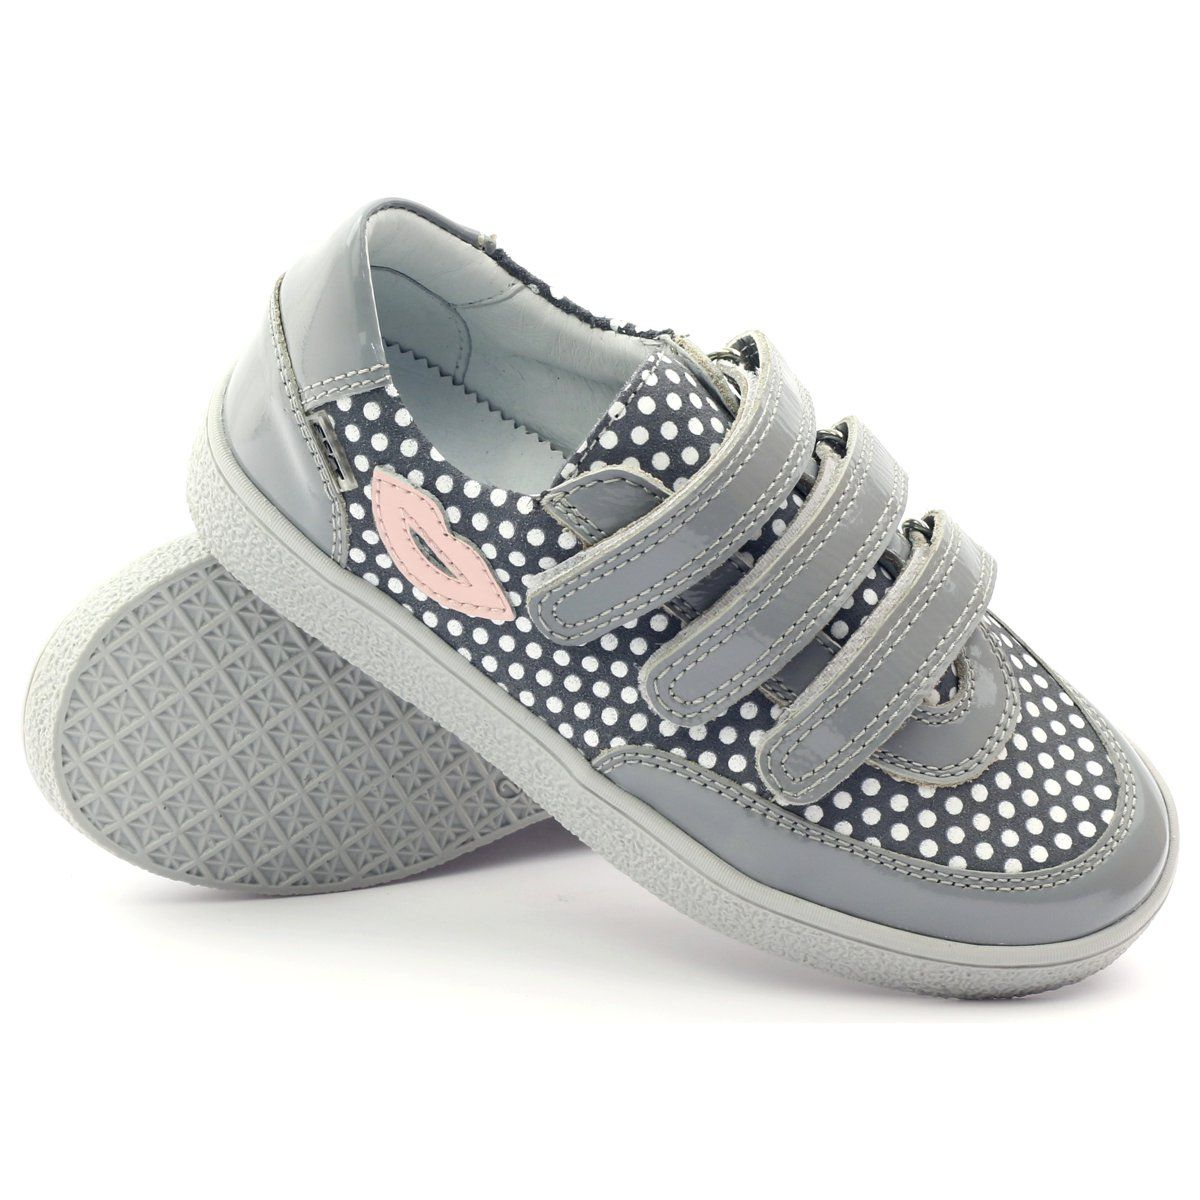 Bartek Buty Na Rzepy Szare W Kropki 35651 Rozowe Biale Kid Shoes Childrens Shoes Boots